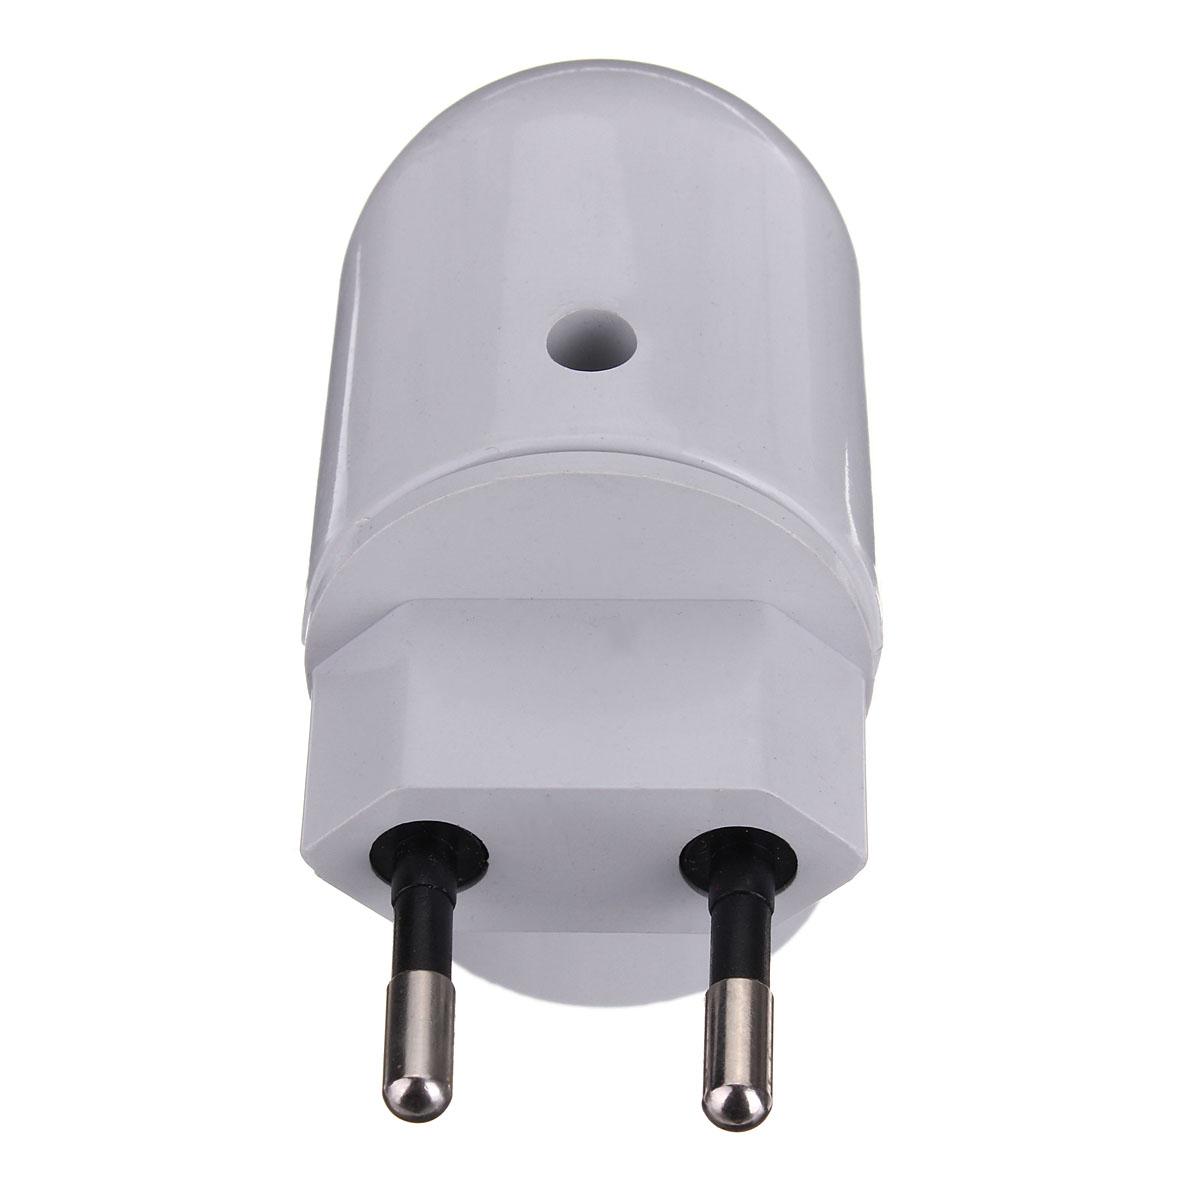 e27 culot prise eu plug led lampe titulaire rotatif convertisseur bouton on off ebay. Black Bedroom Furniture Sets. Home Design Ideas